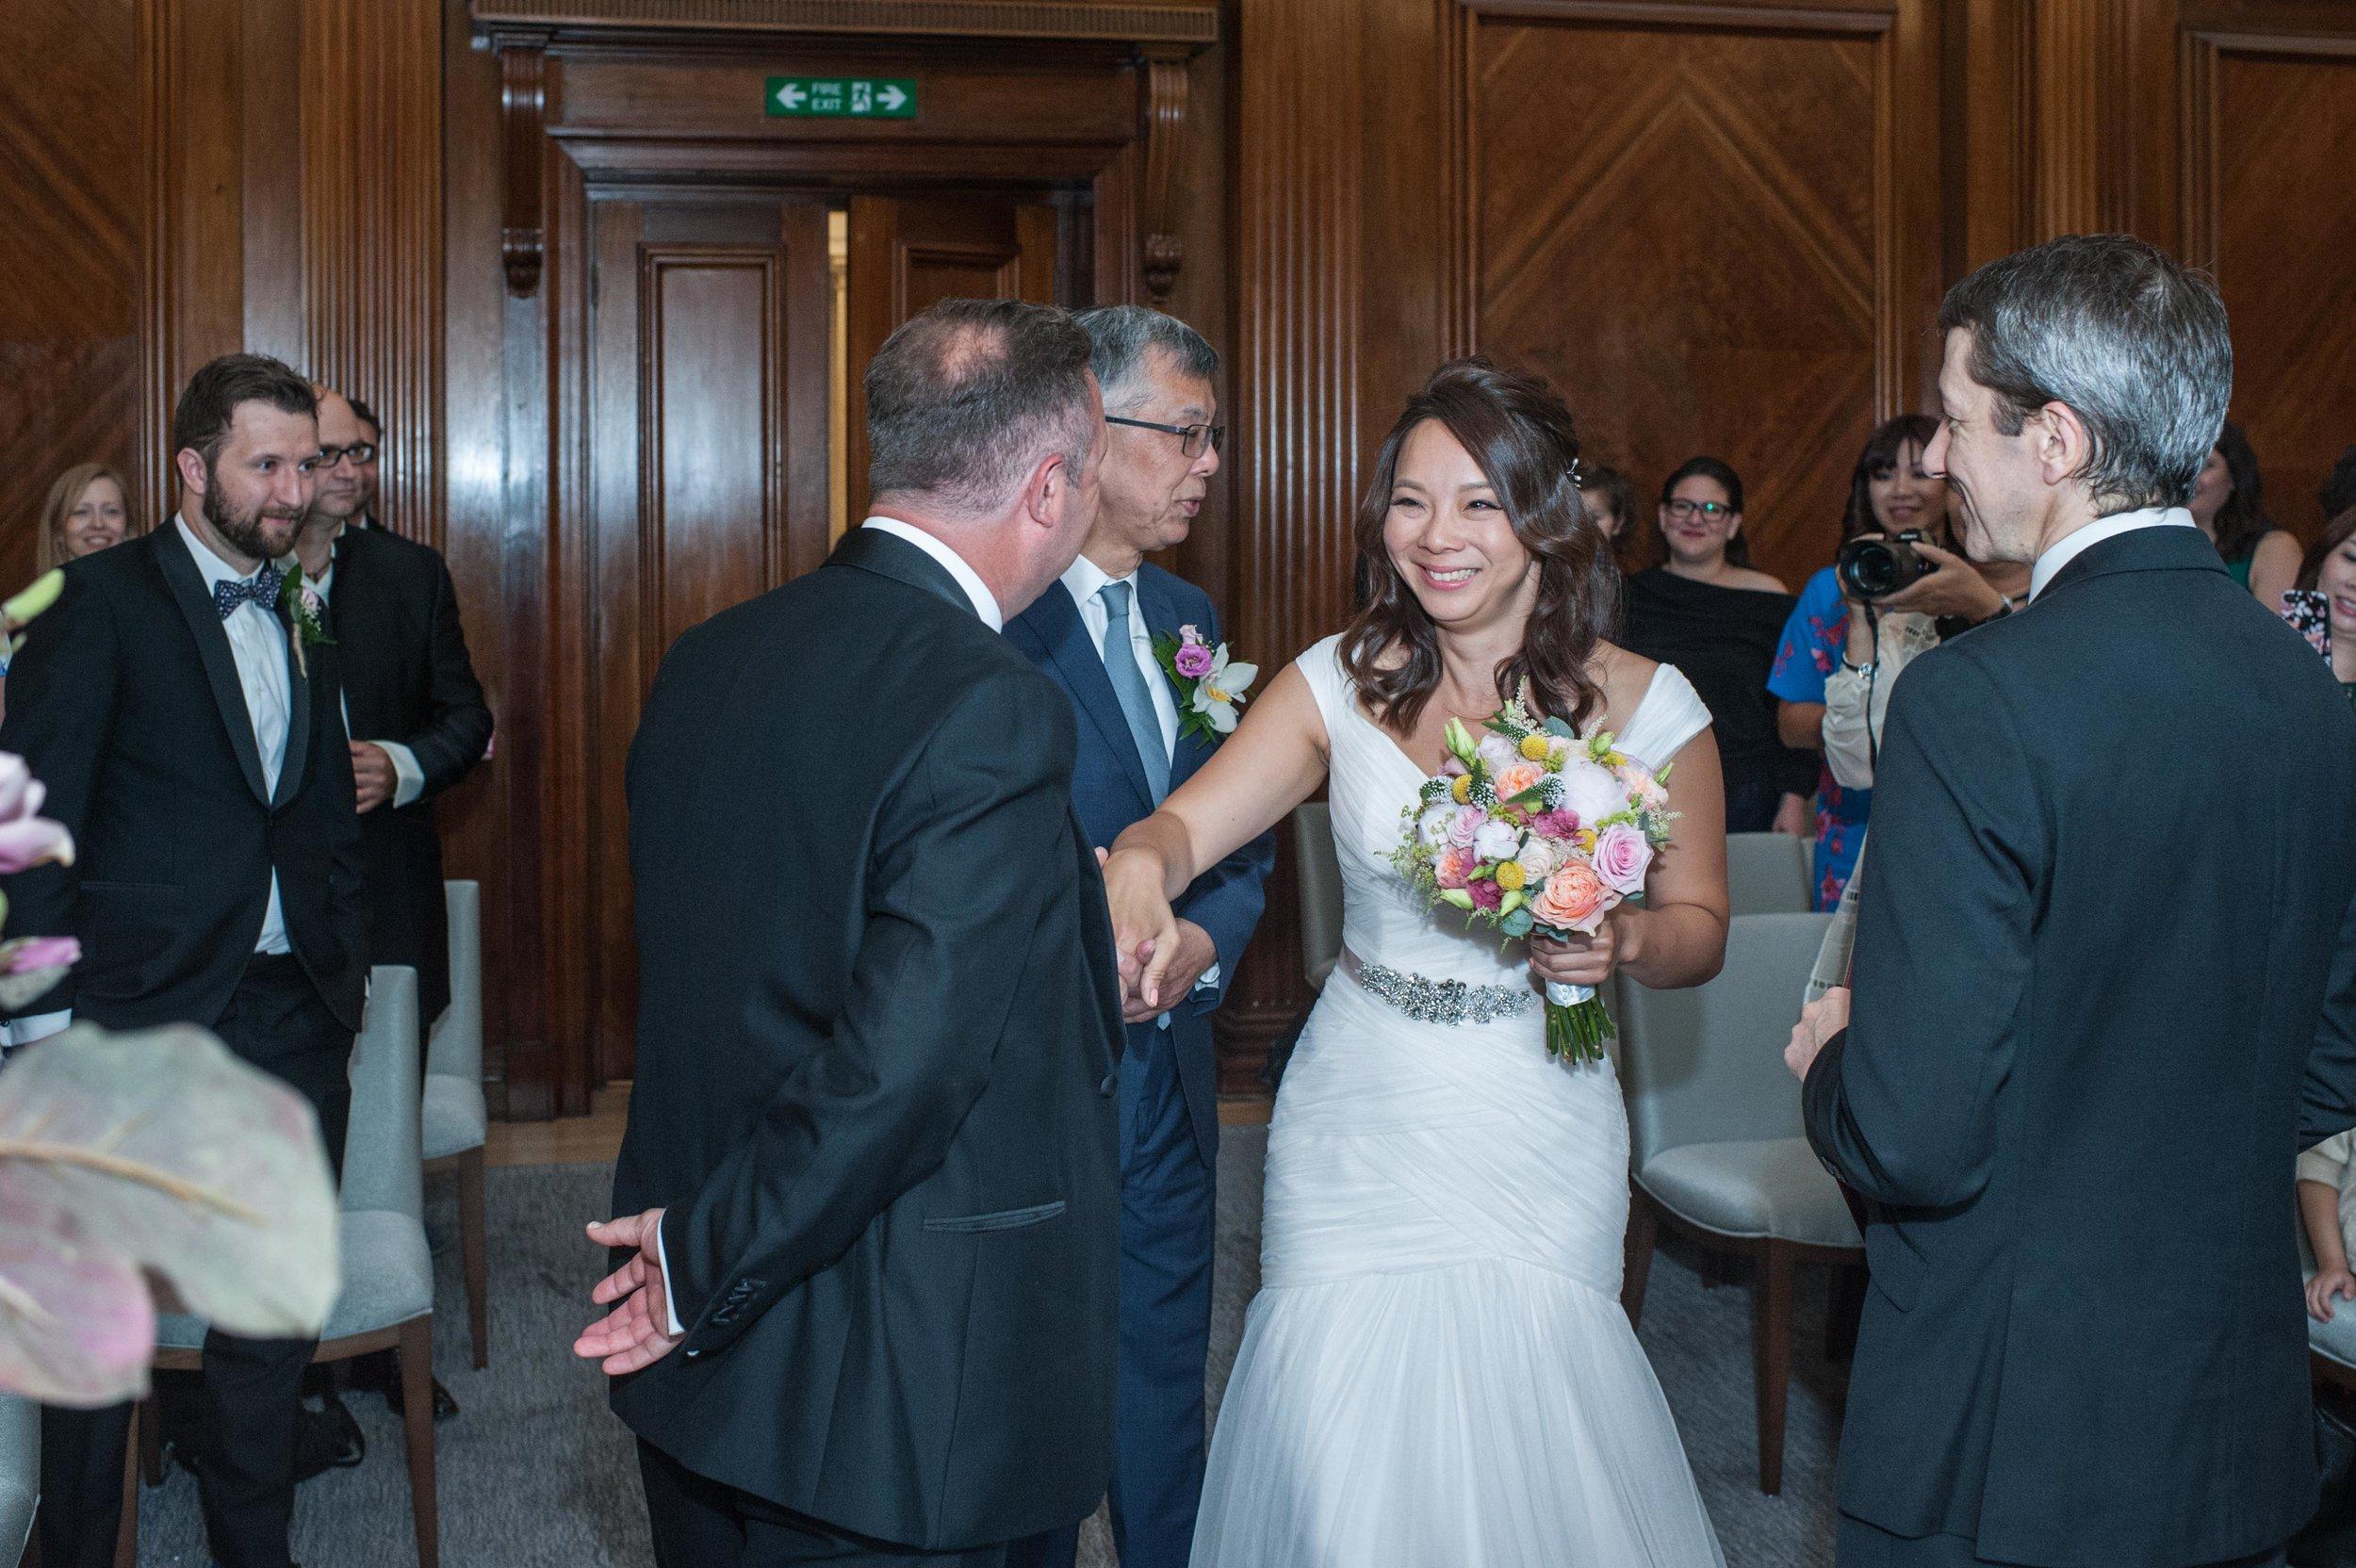 D&M_Marylebone Town Hall Wedding (91 of 239).jpg